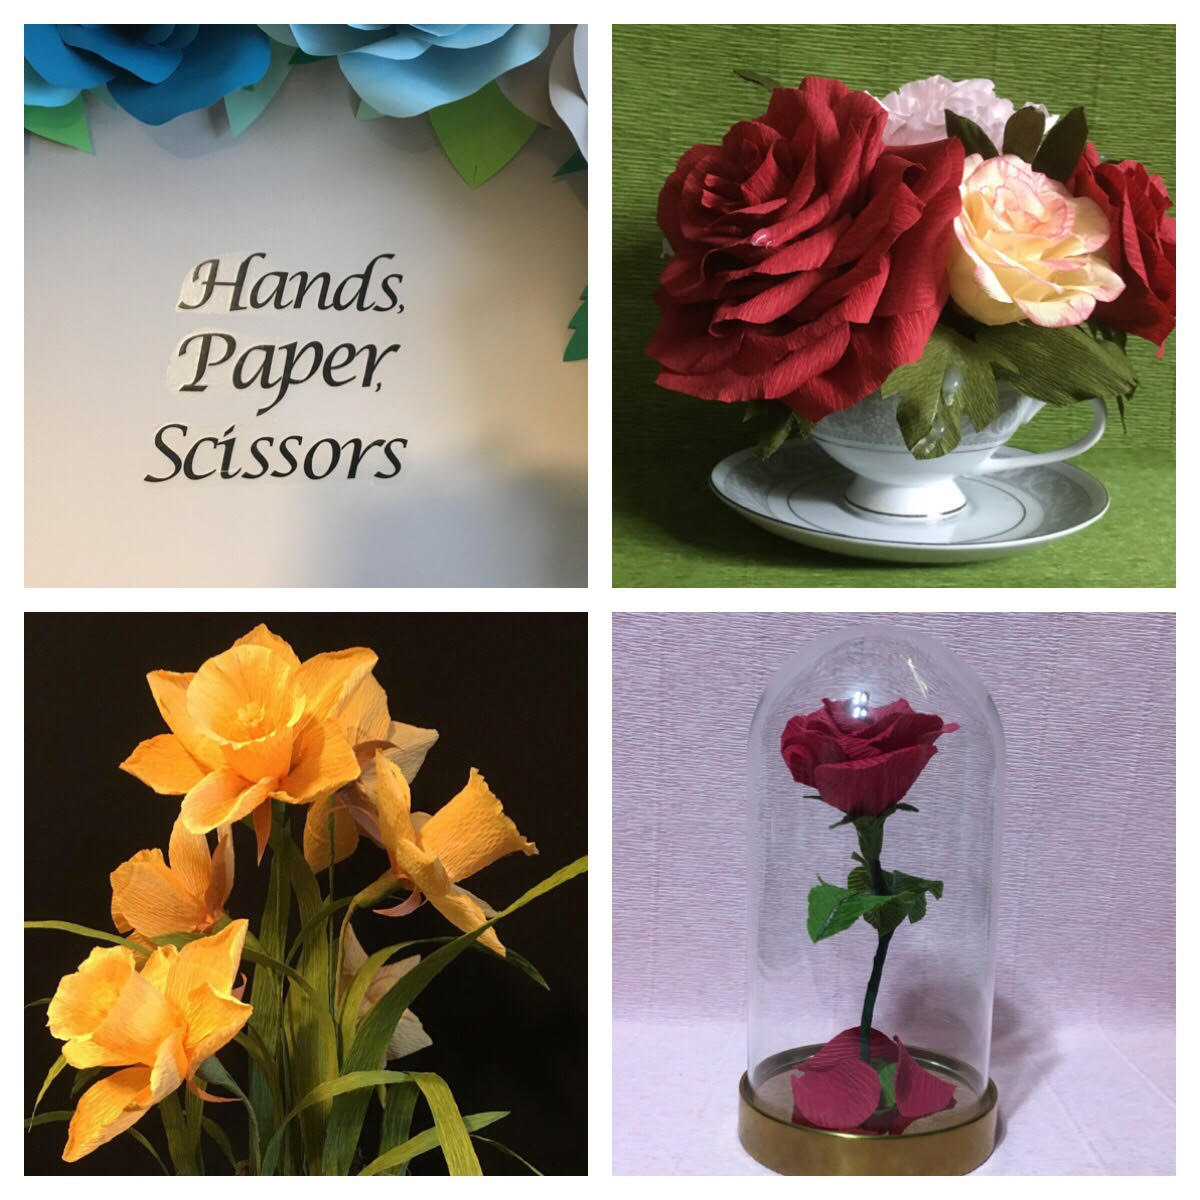 Hand, Paper, Scissors